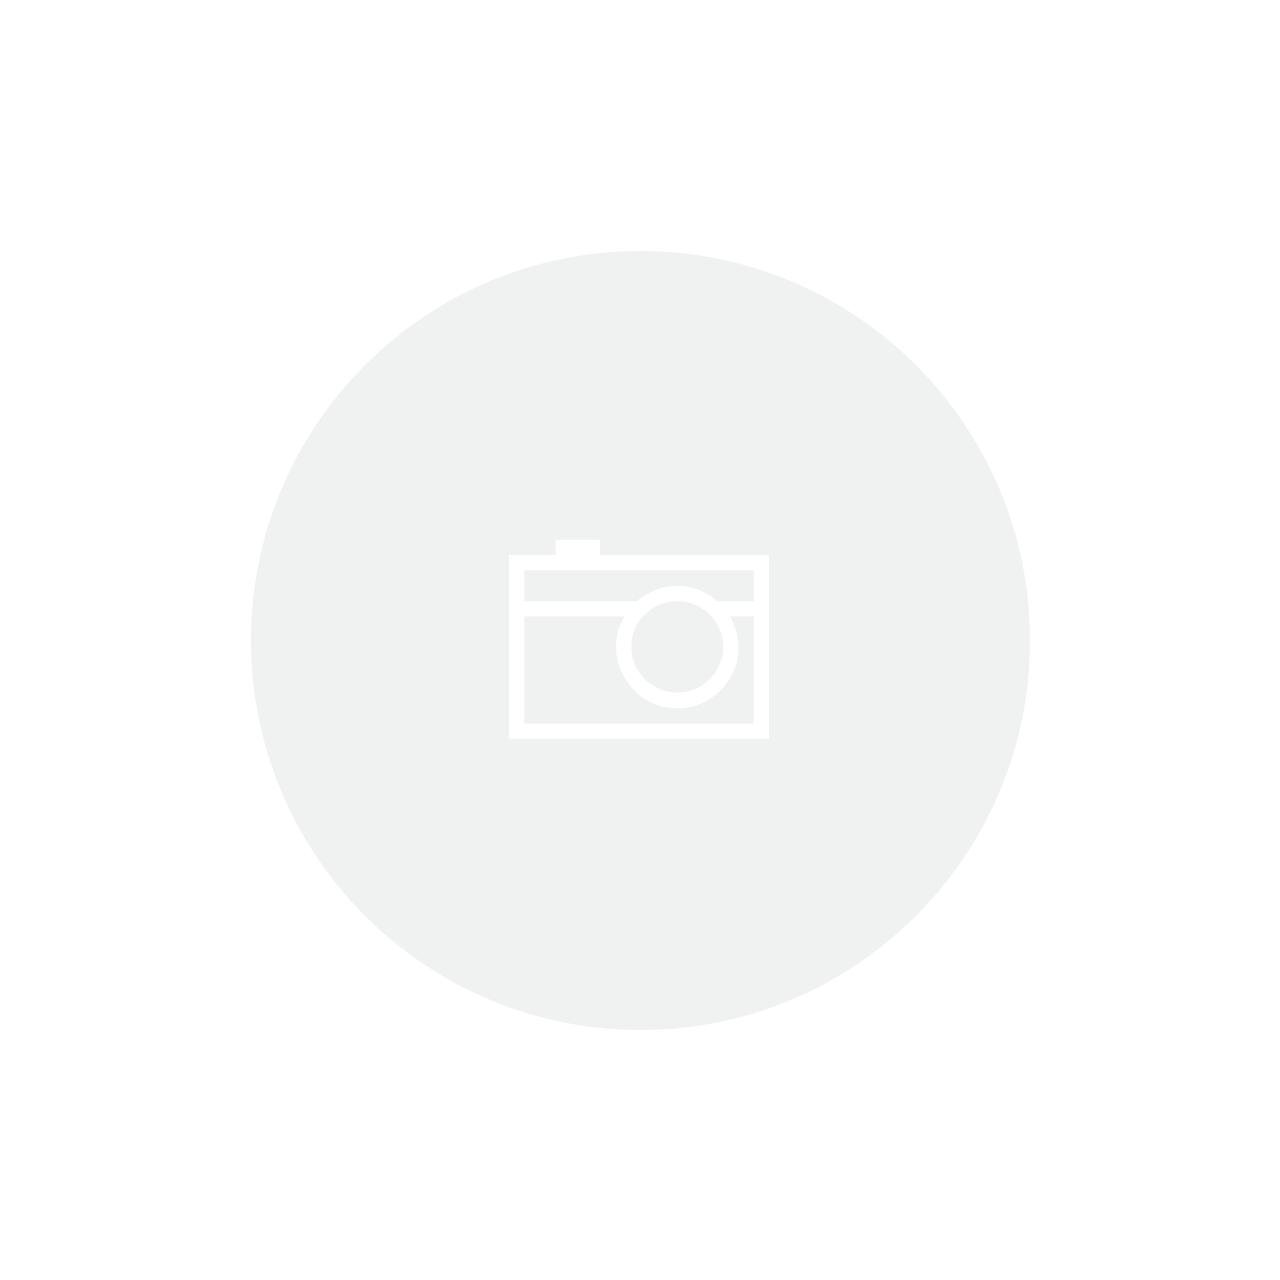 Anilha Bicromatizada (Pacote c/ 1000 Unidades)